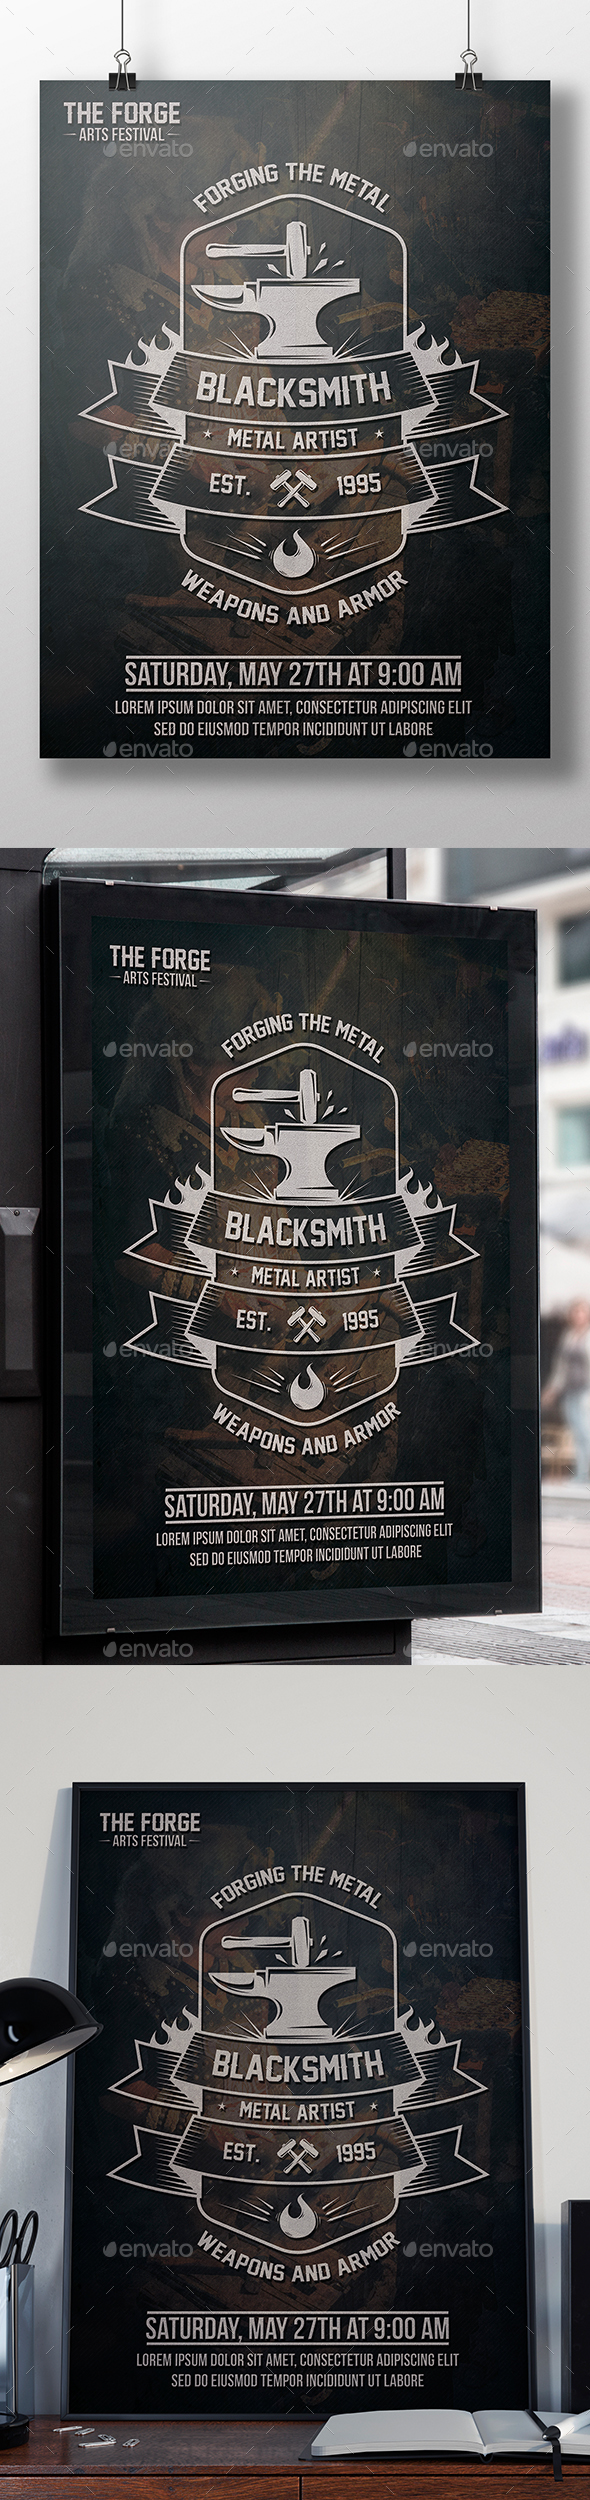 Blacksmith Flyer Template - Miscellaneous Events